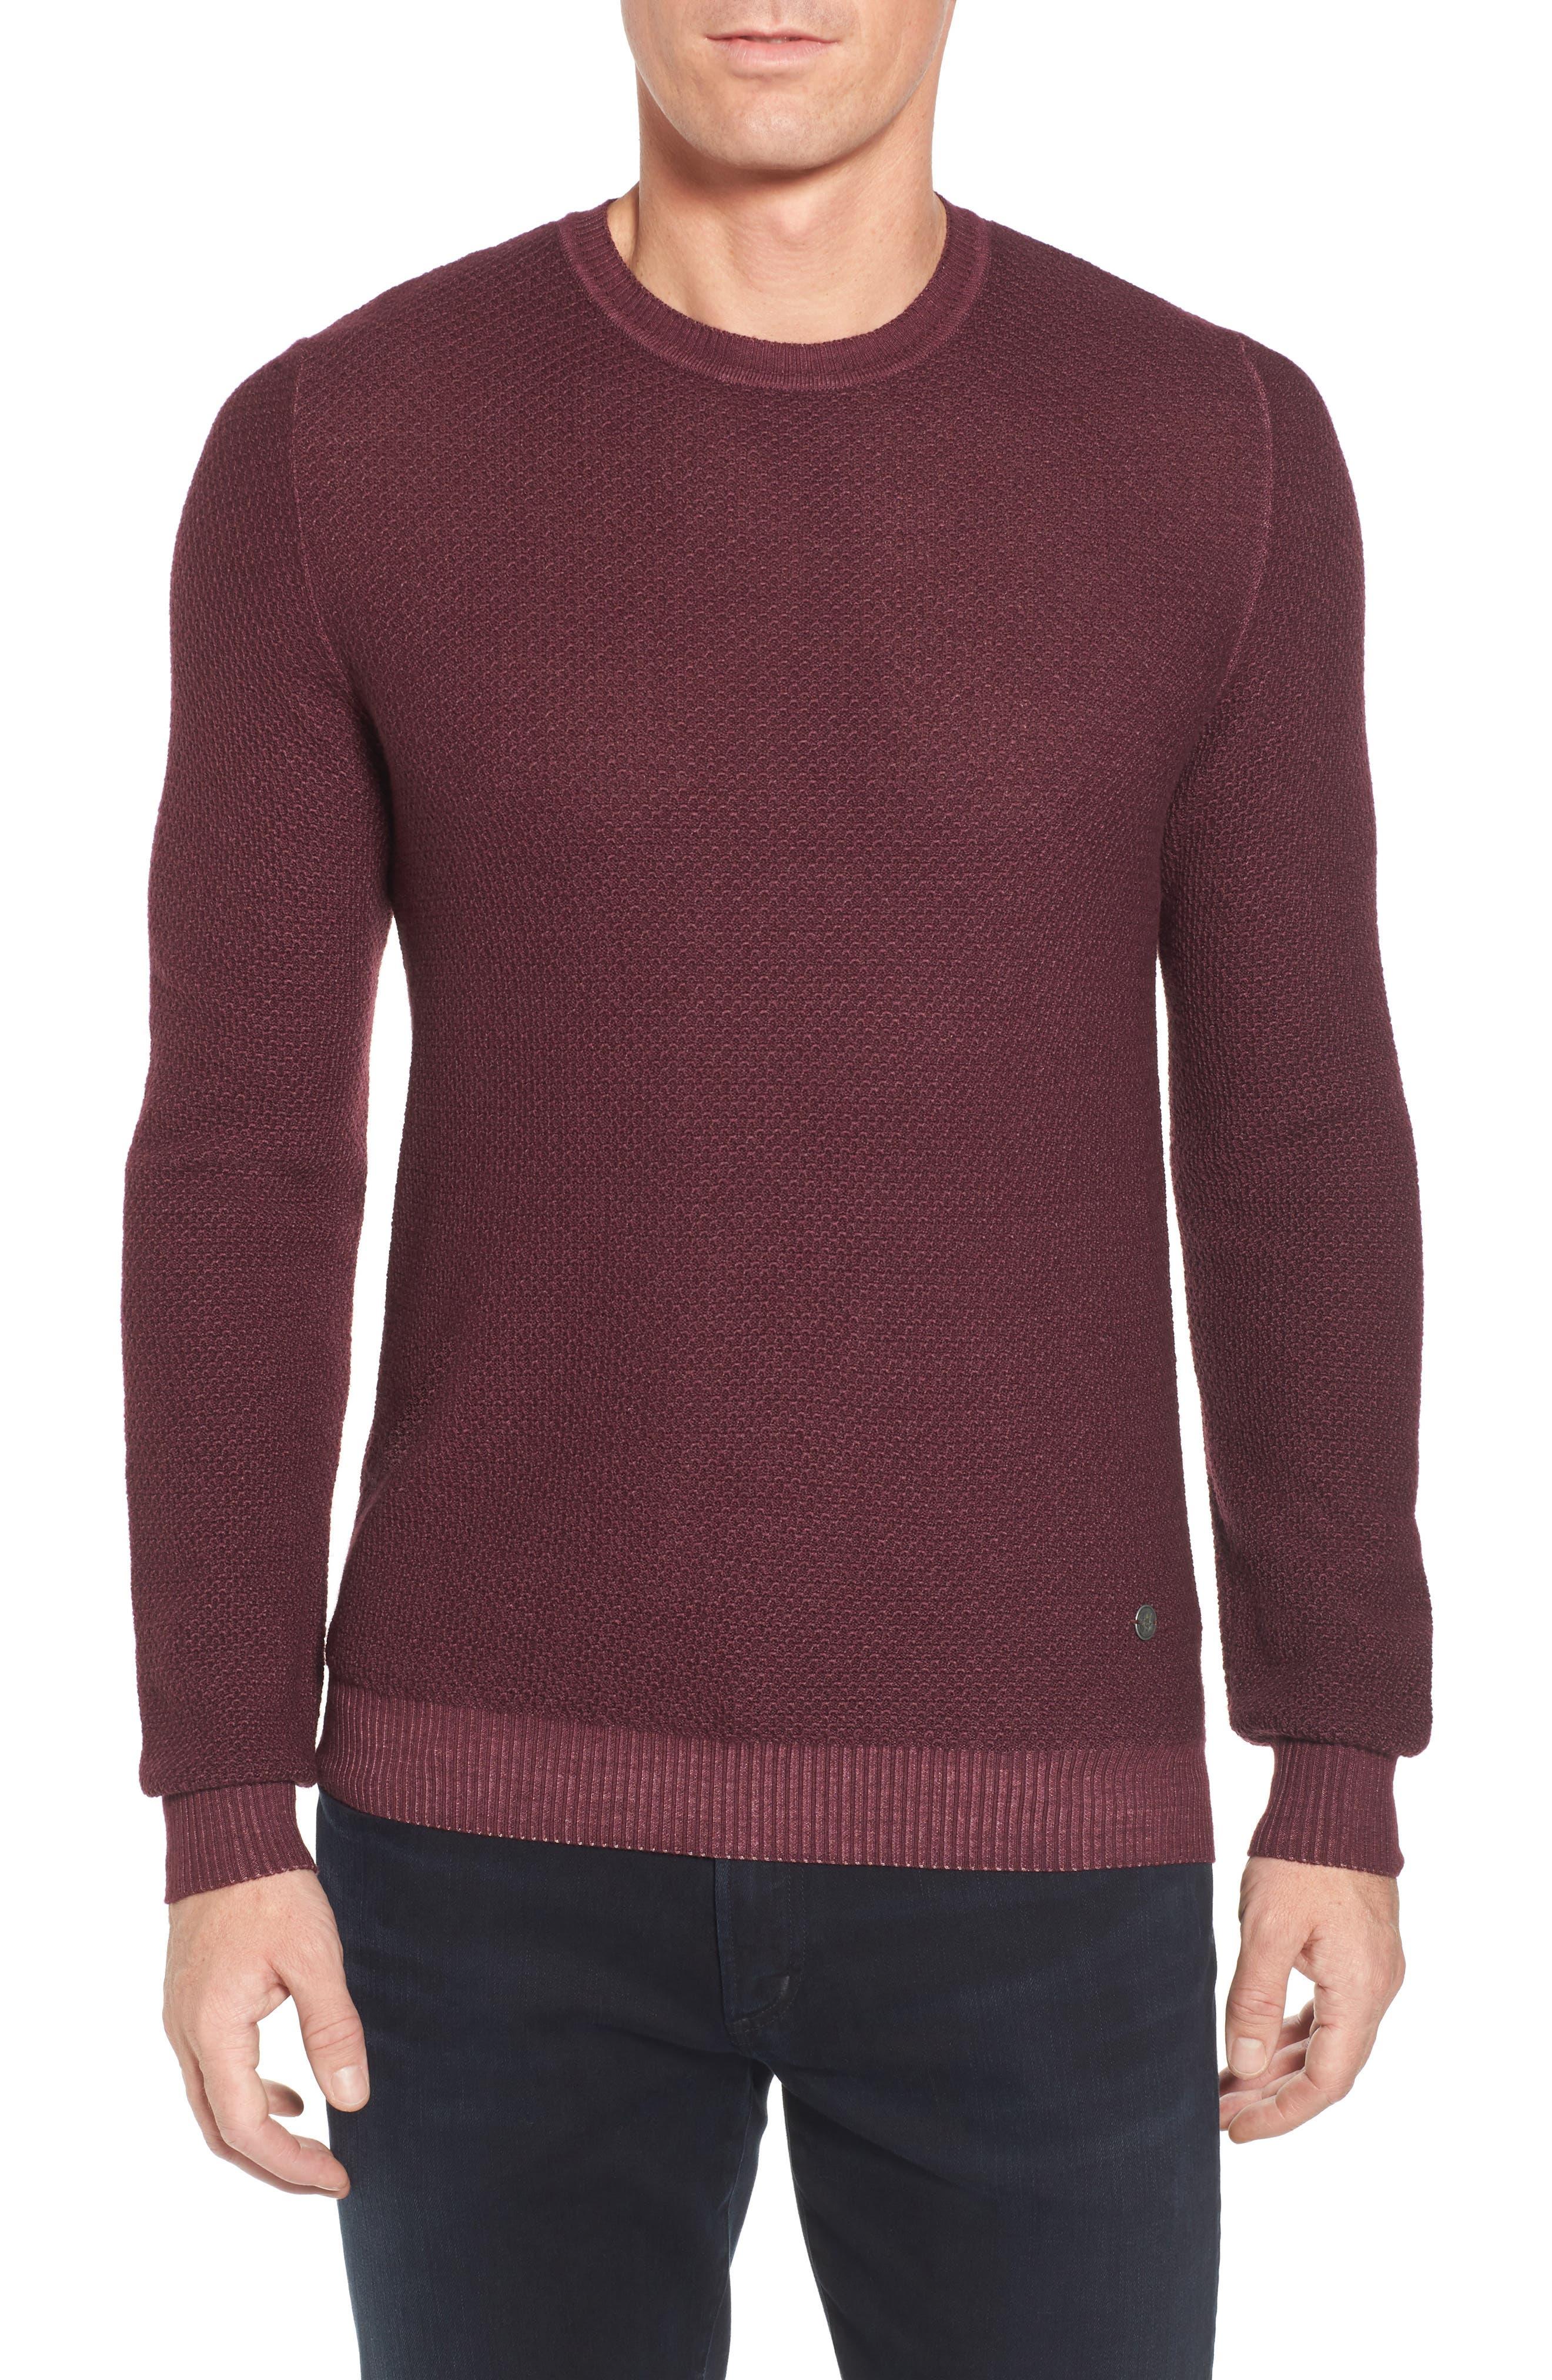 Honeycomb Merino Crewneck Sweater,                         Main,                         color, Burgundy